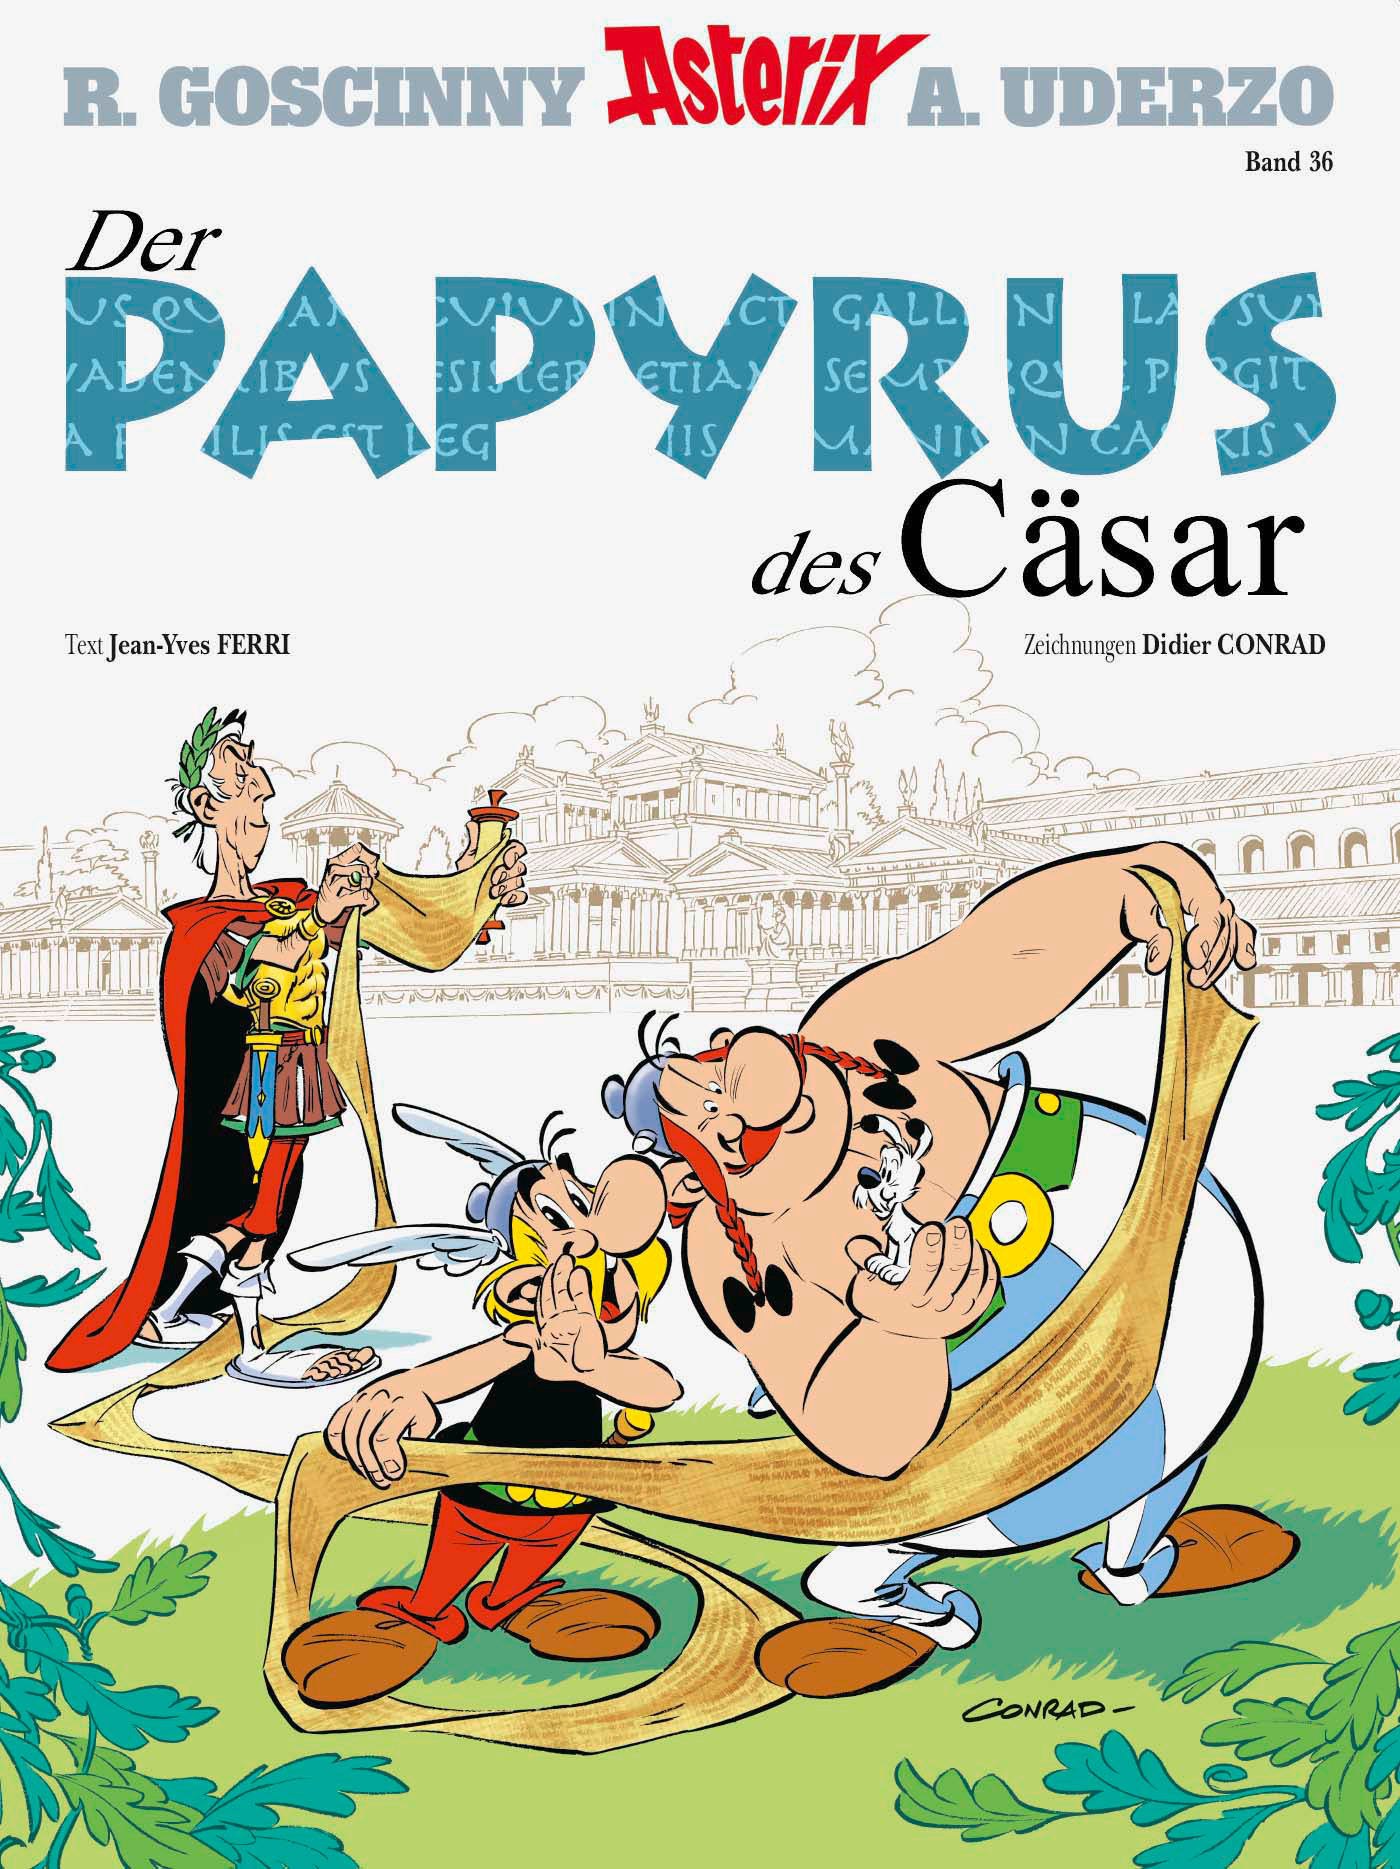 crff171 asterix 36 der papyrus des c sar comic review. Black Bedroom Furniture Sets. Home Design Ideas